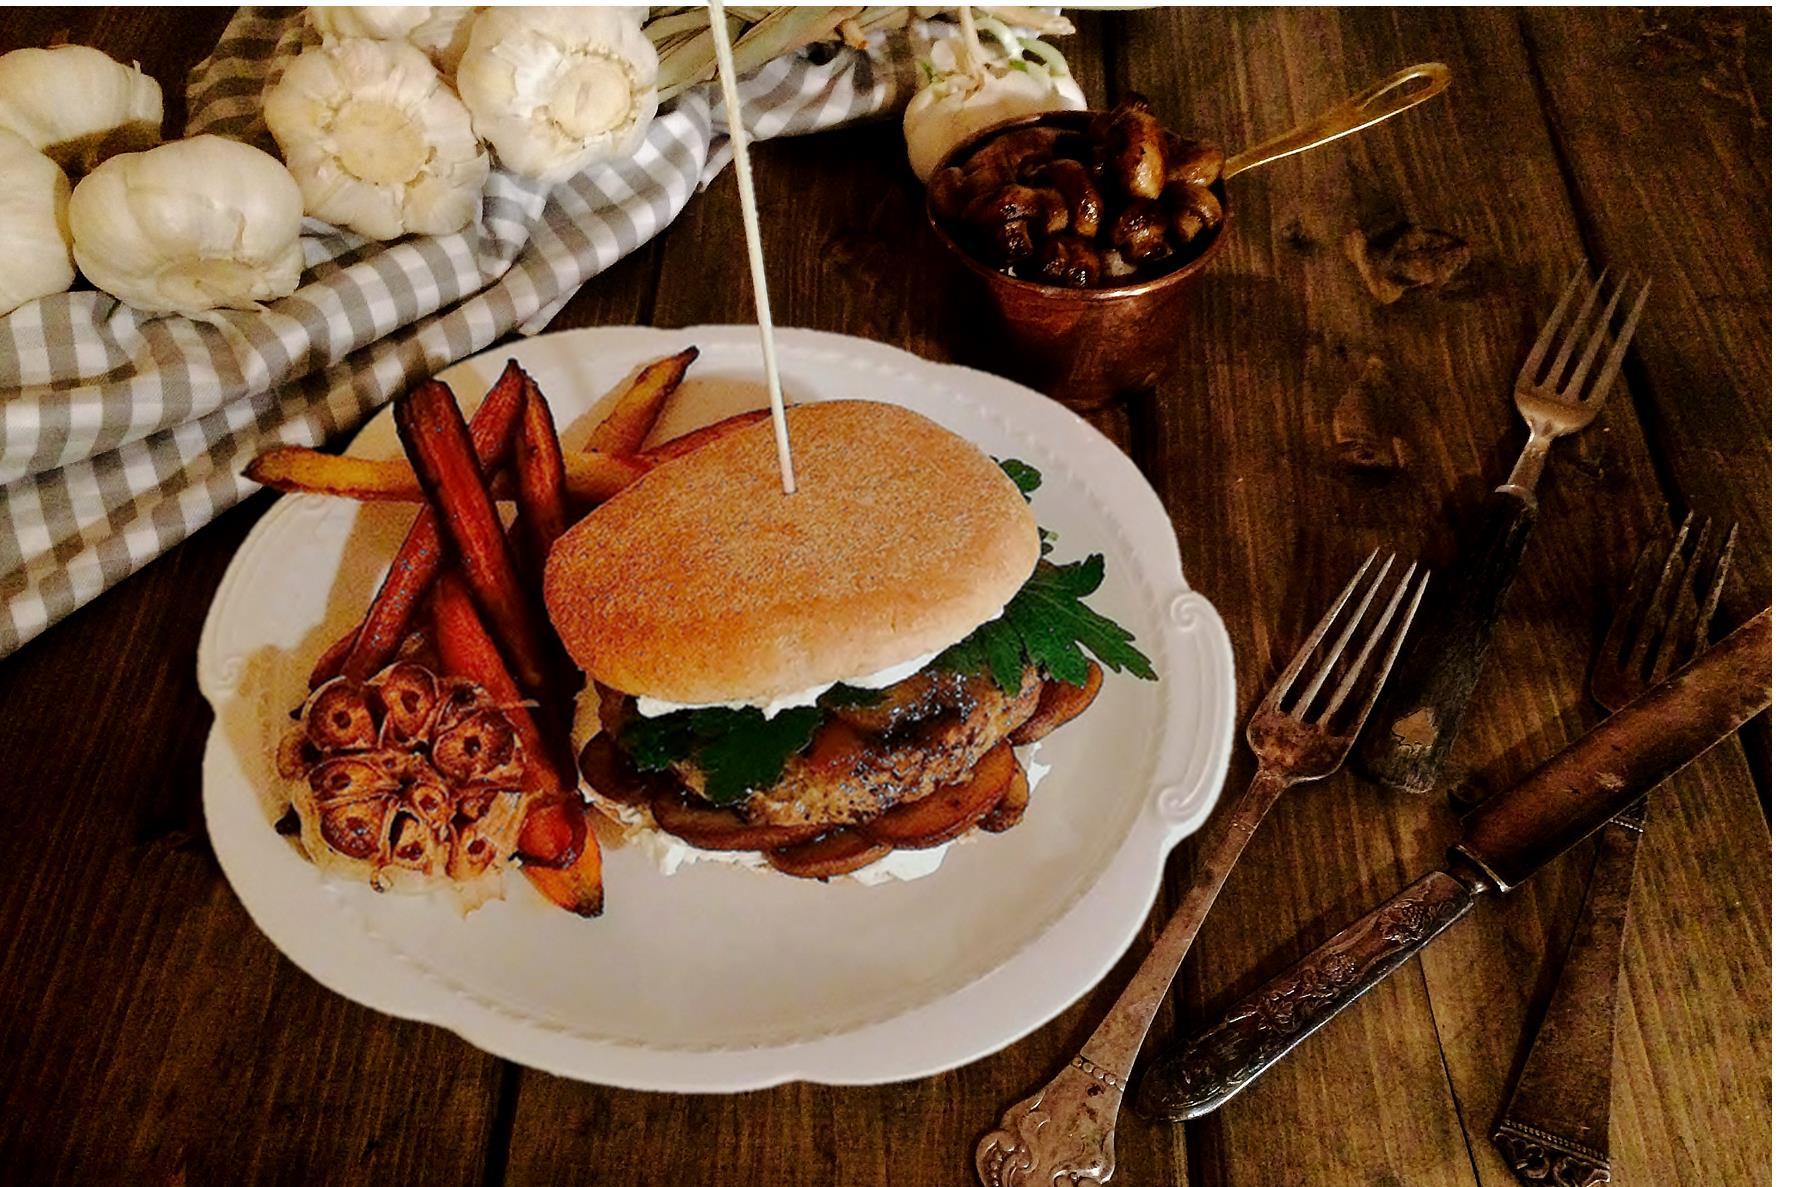 Jucy Venison Burger & Baked Rainbow Carrots